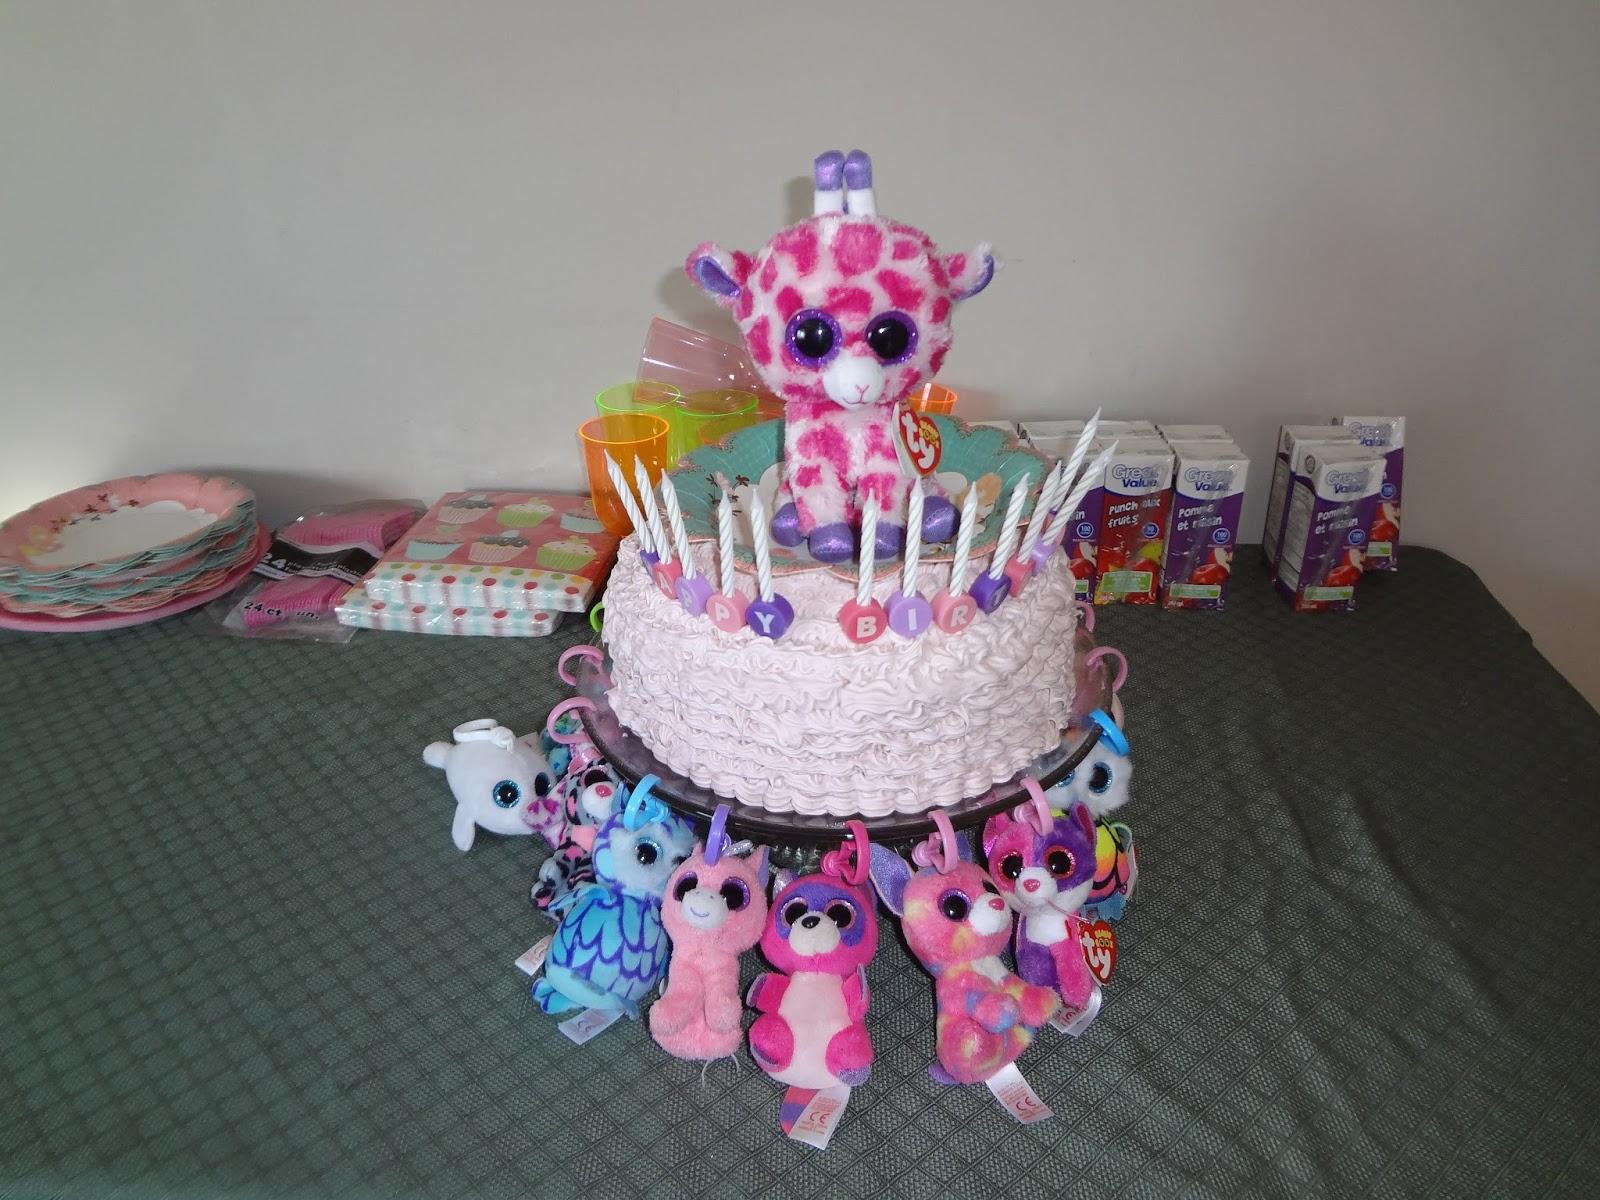 How To Make A Beanie Boo Birthday Cake